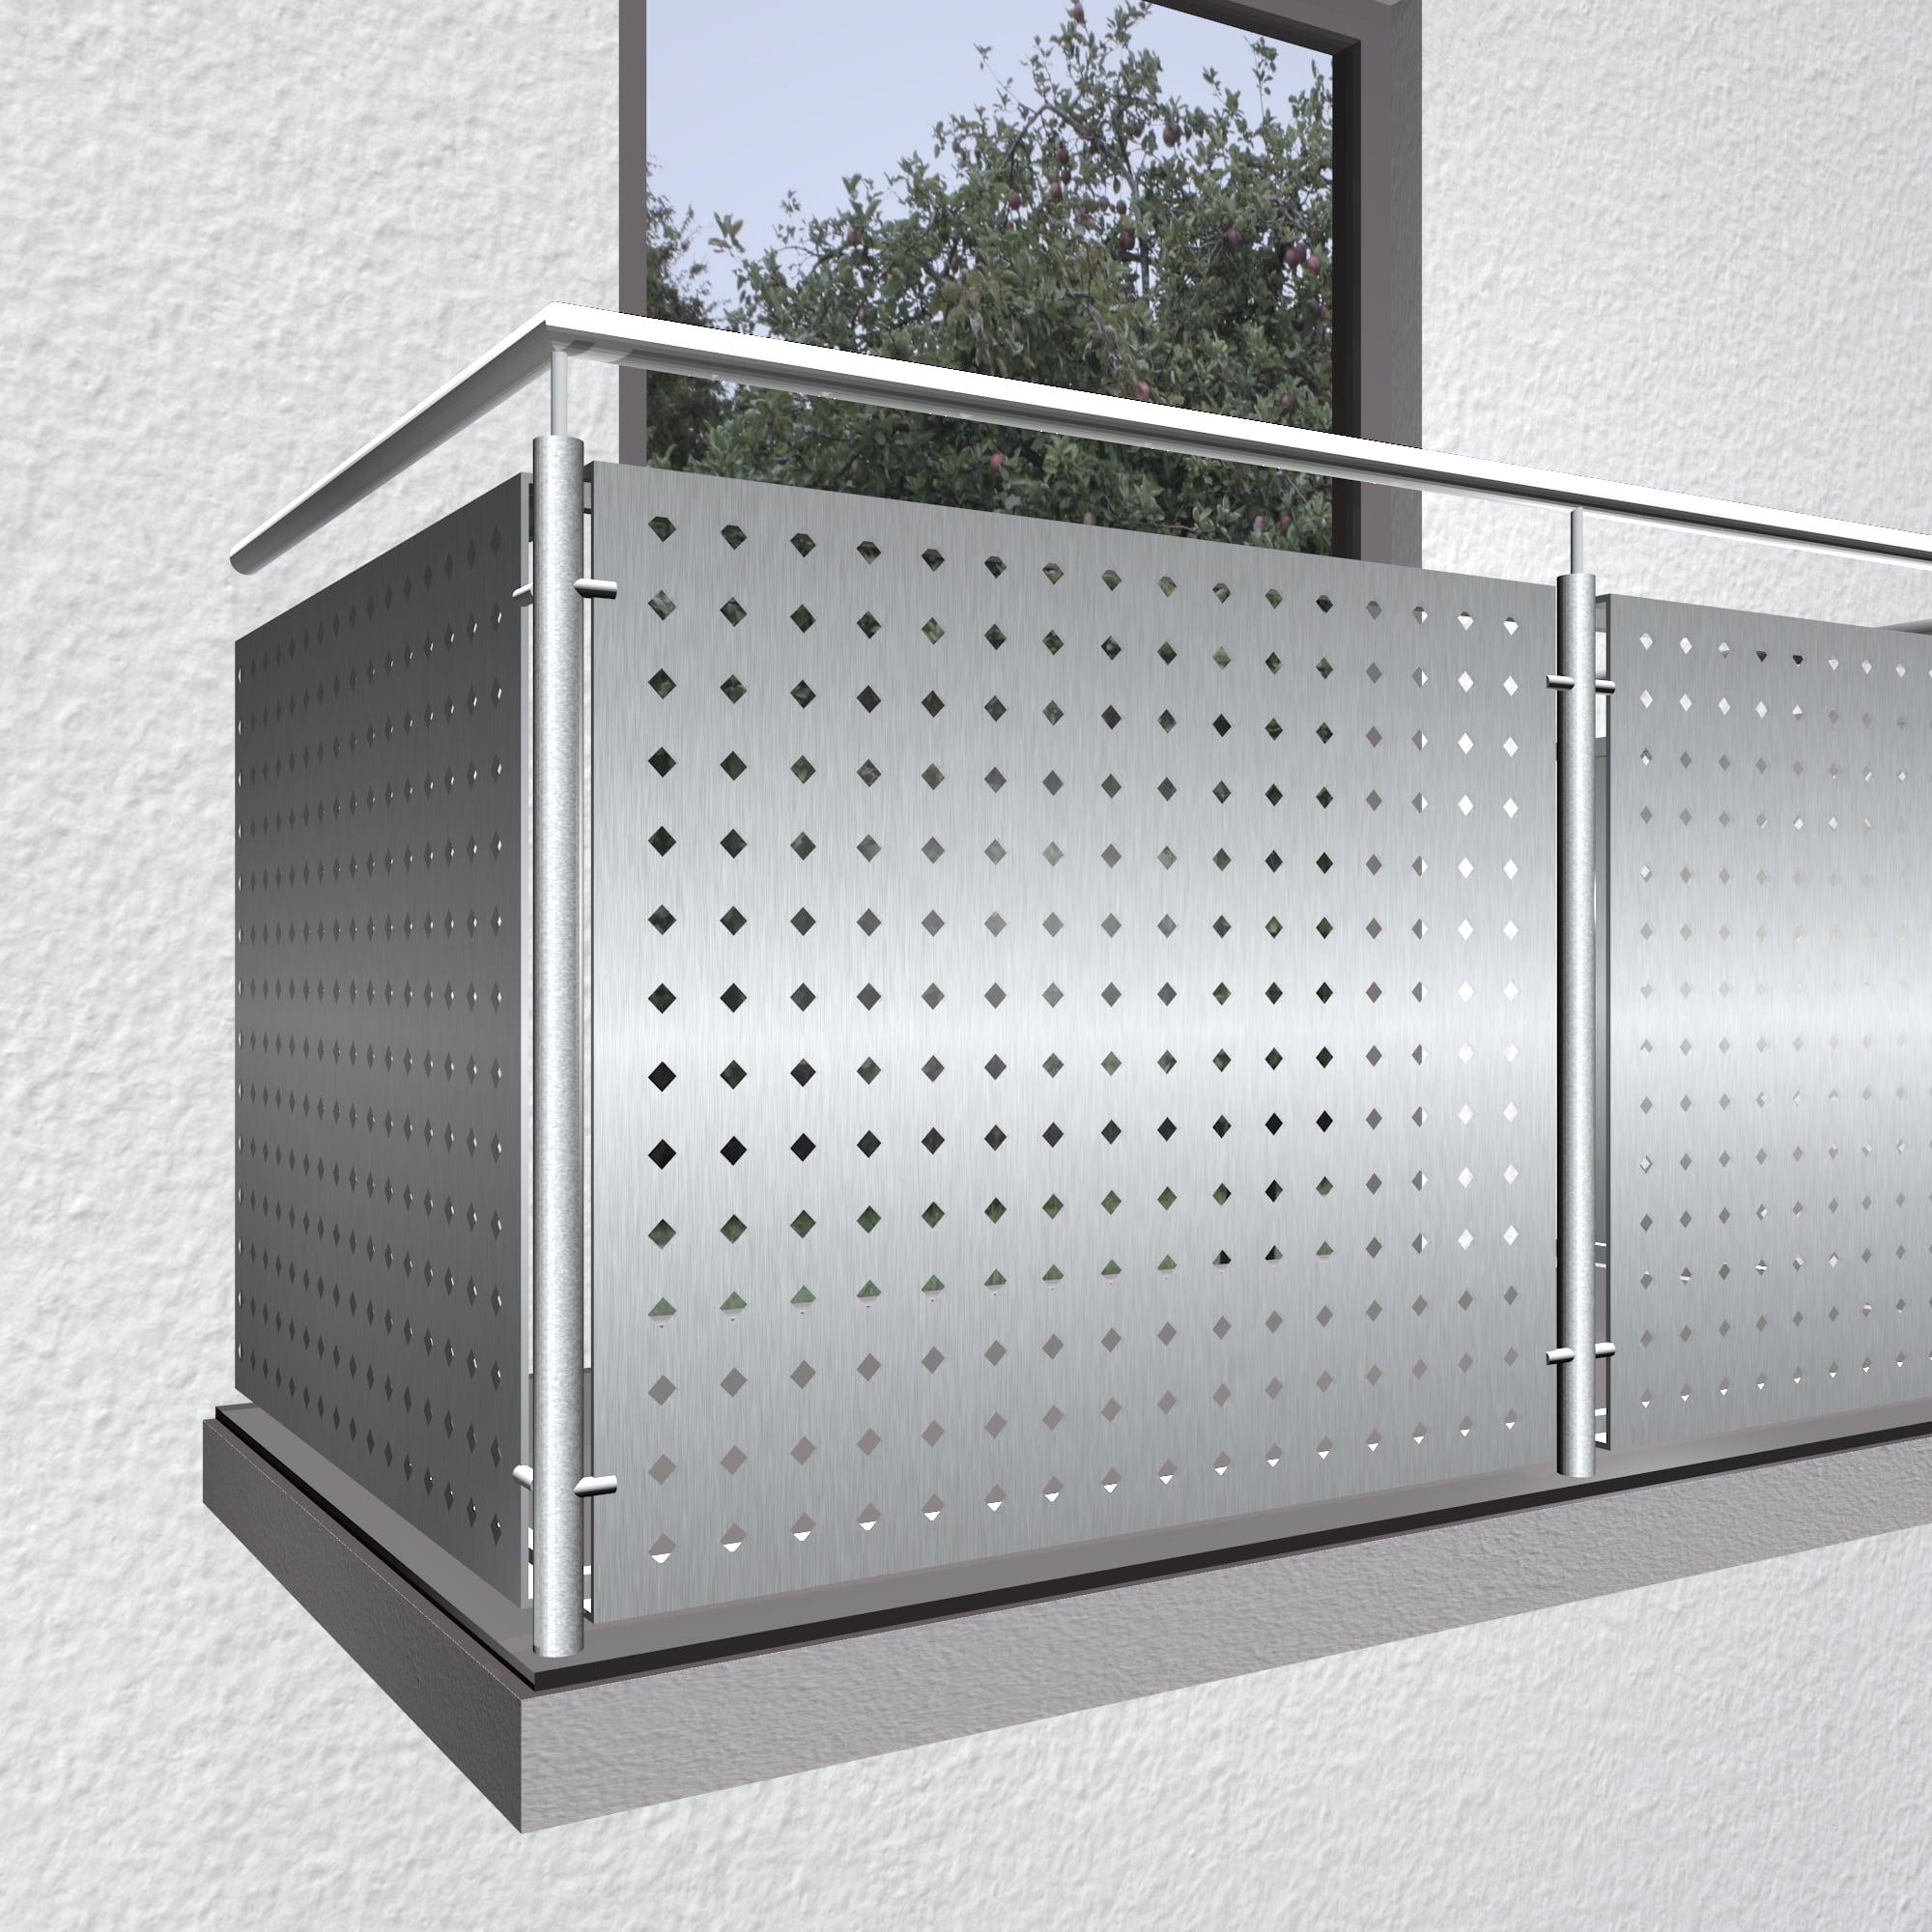 Balkonverkleidung Edelstahl QL DI GE